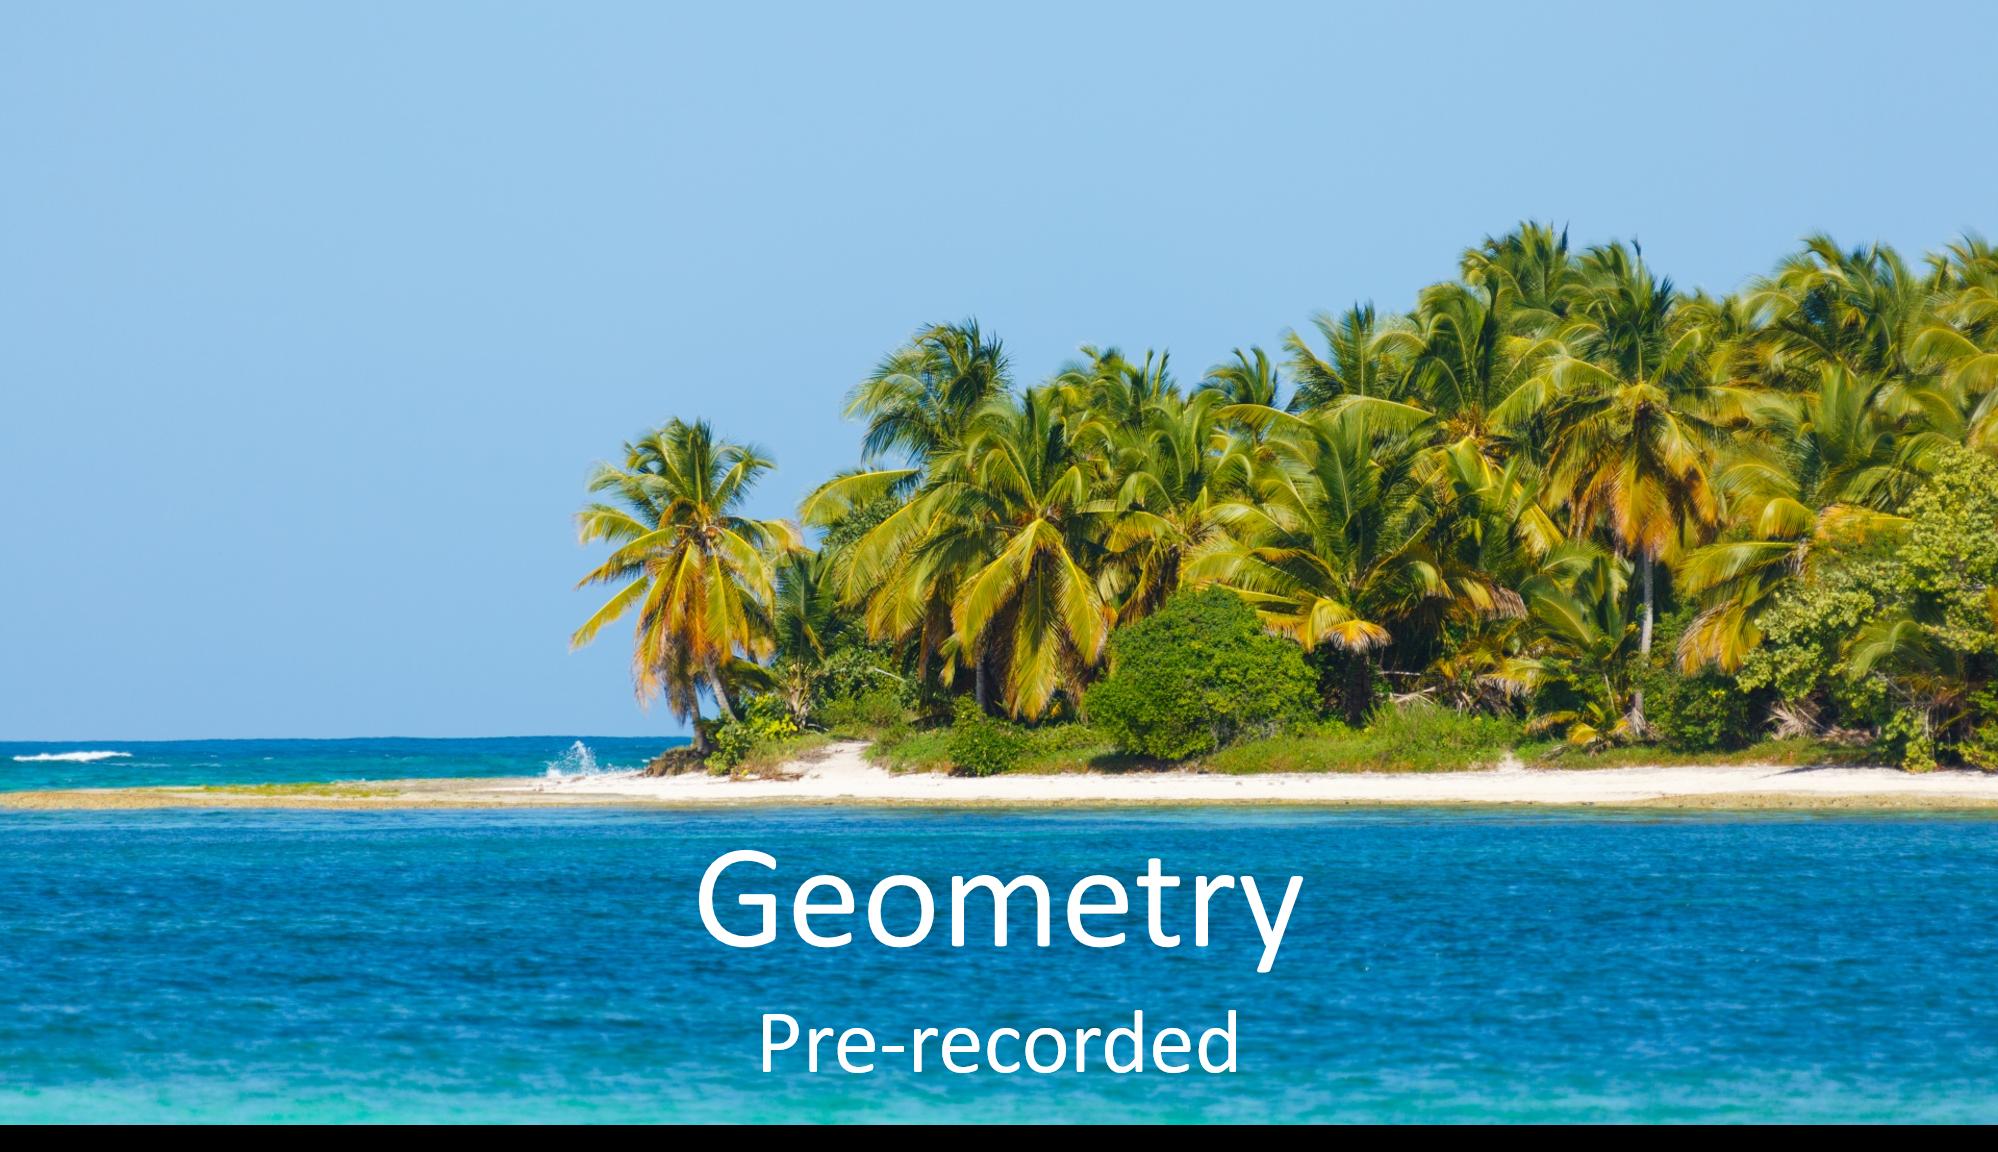 Geometry (Pre-recorded)